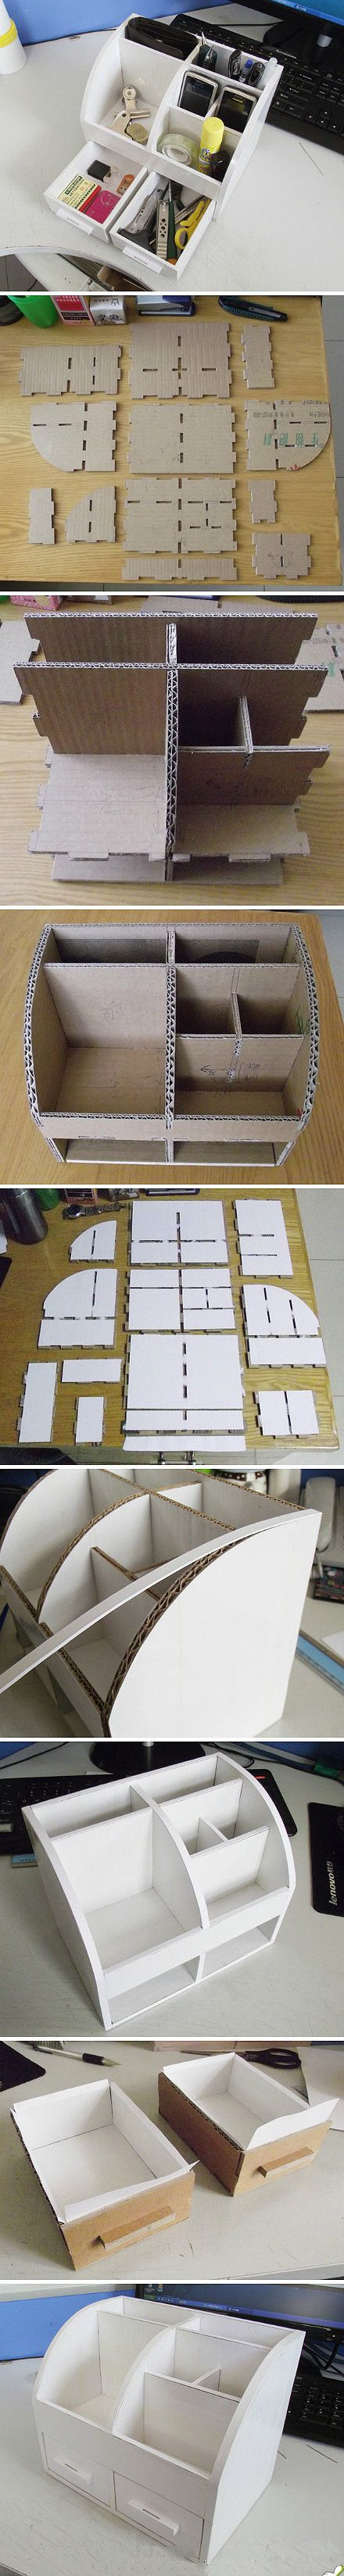 Diy desk cardboard organizer and diy and crafts on pinterest - Make your own desk organizer ...